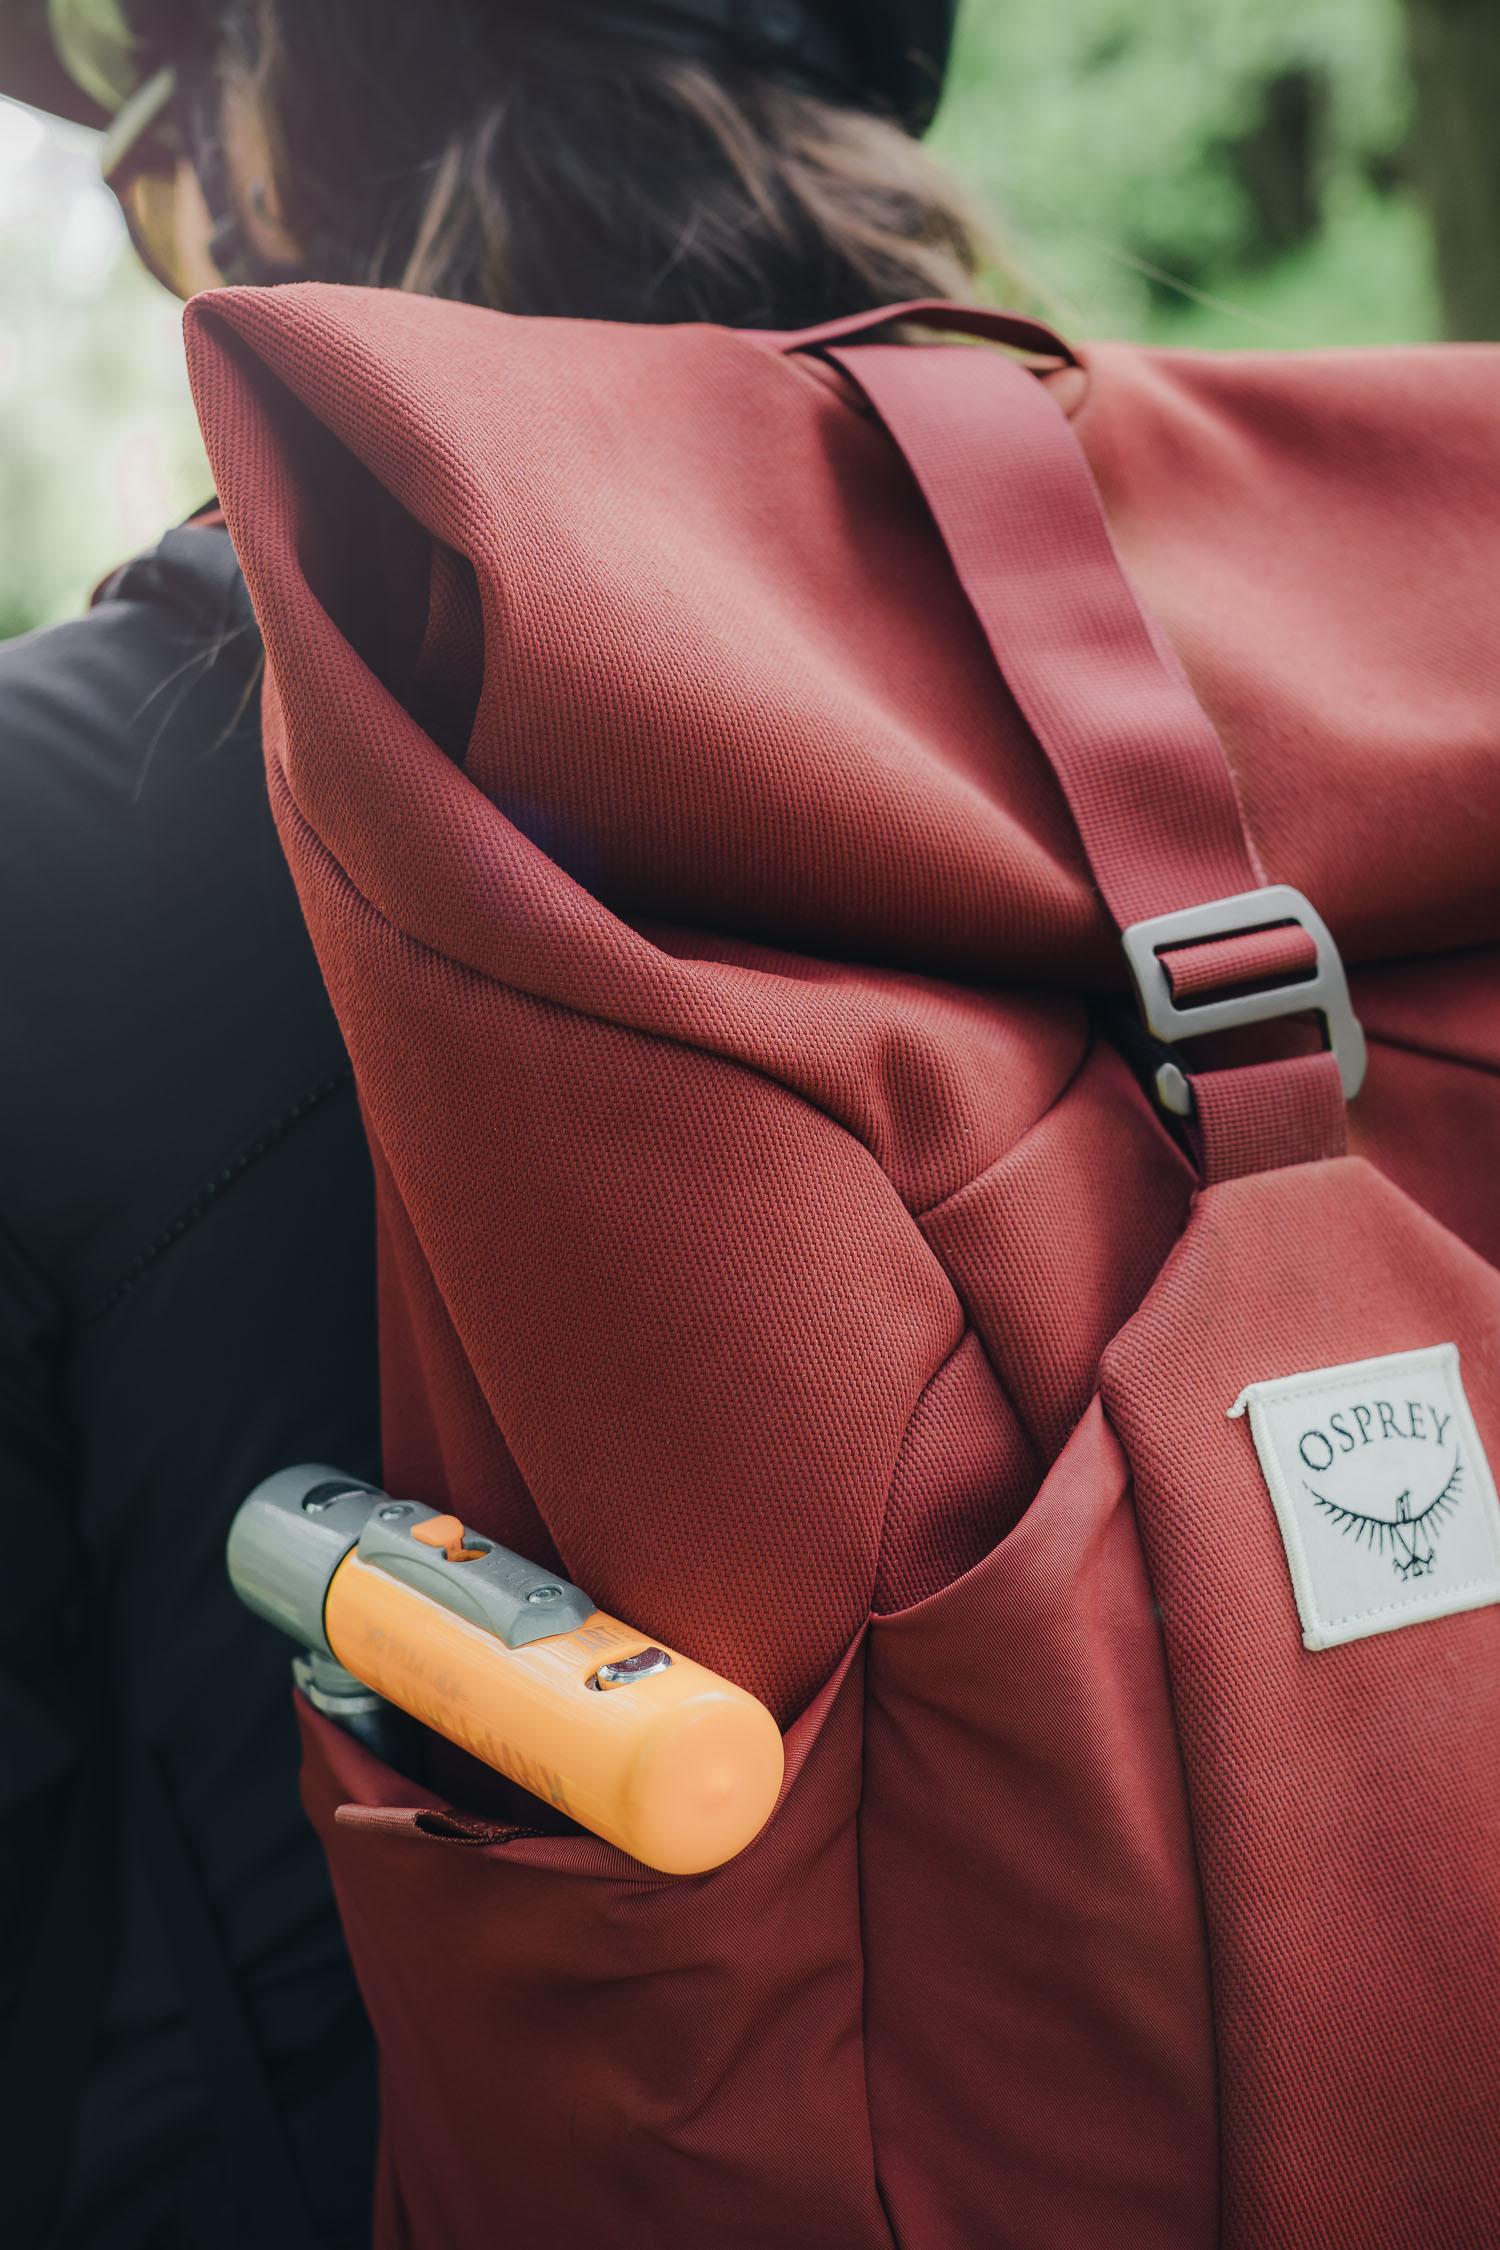 Osprey Archeon backpack